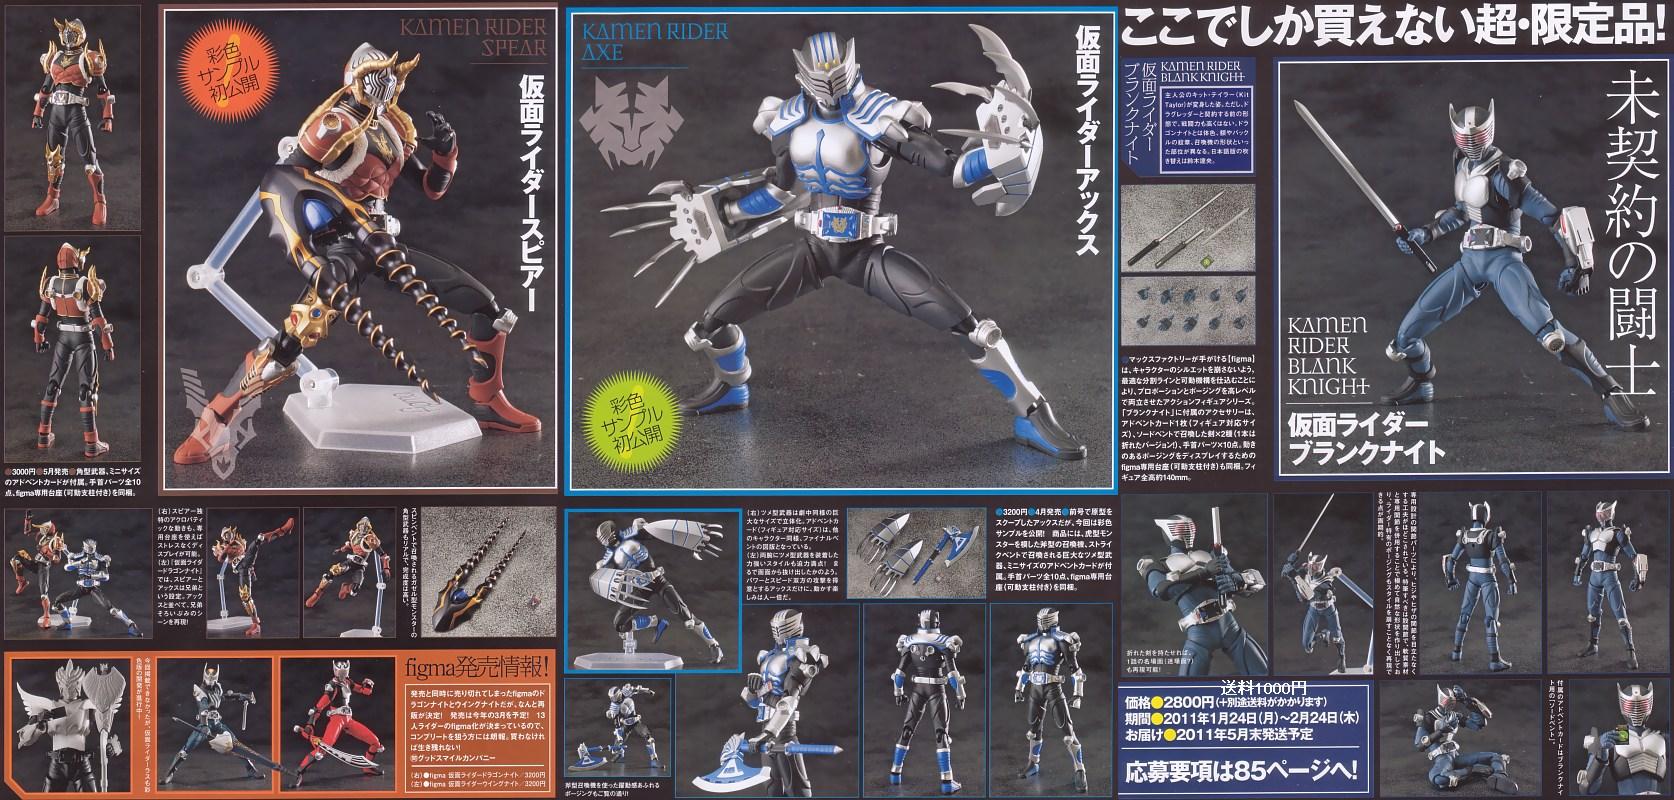 figma max_factory asai_(apsy)_masaki kamen_rider_dragon_knight kamen_rider_axe kamen_rider_spear kamen_rider_blank_knight